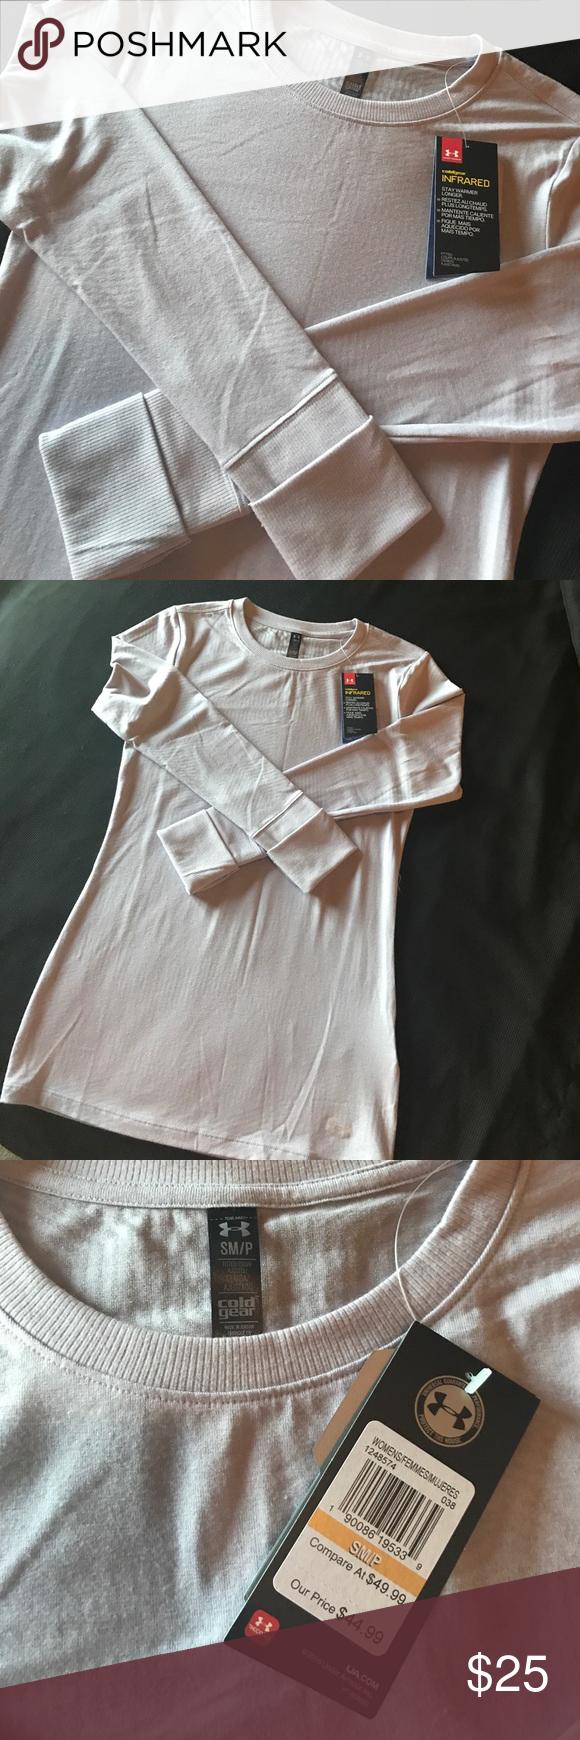 Under armour infrared long sleeve shirt nwt my posh picks